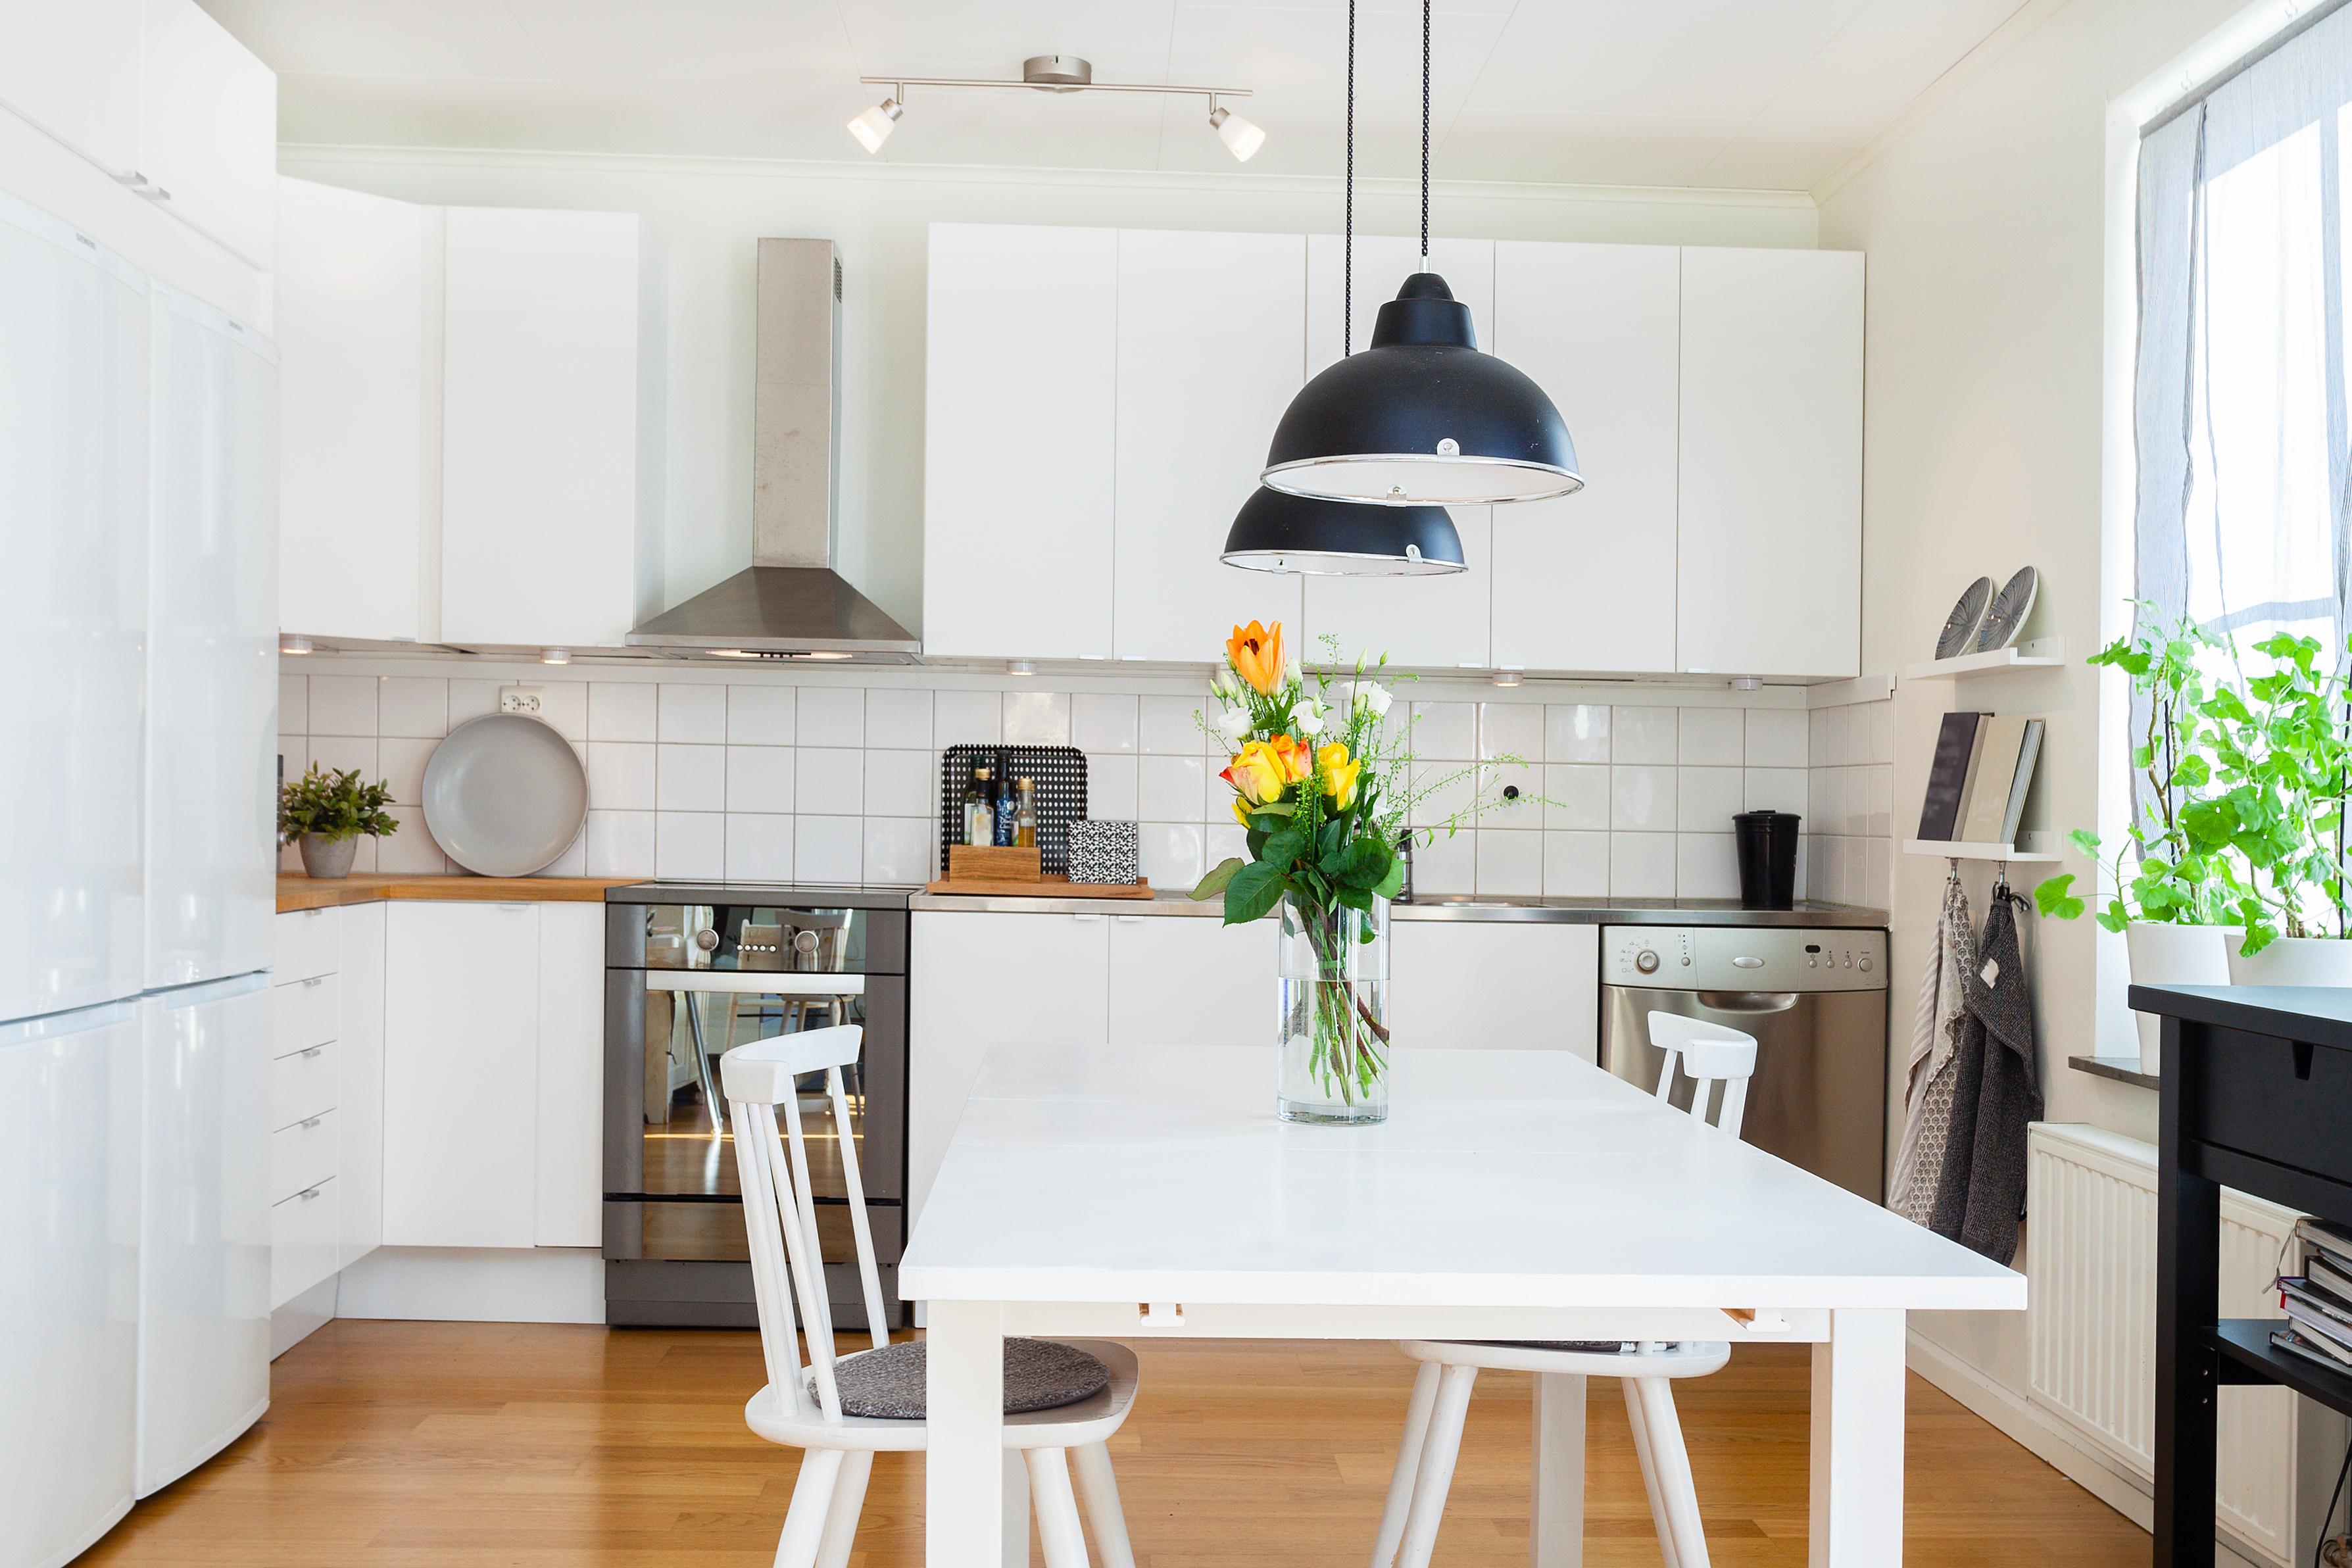 L shape kitchen design goflatpacks - Kitchen design blogs ...